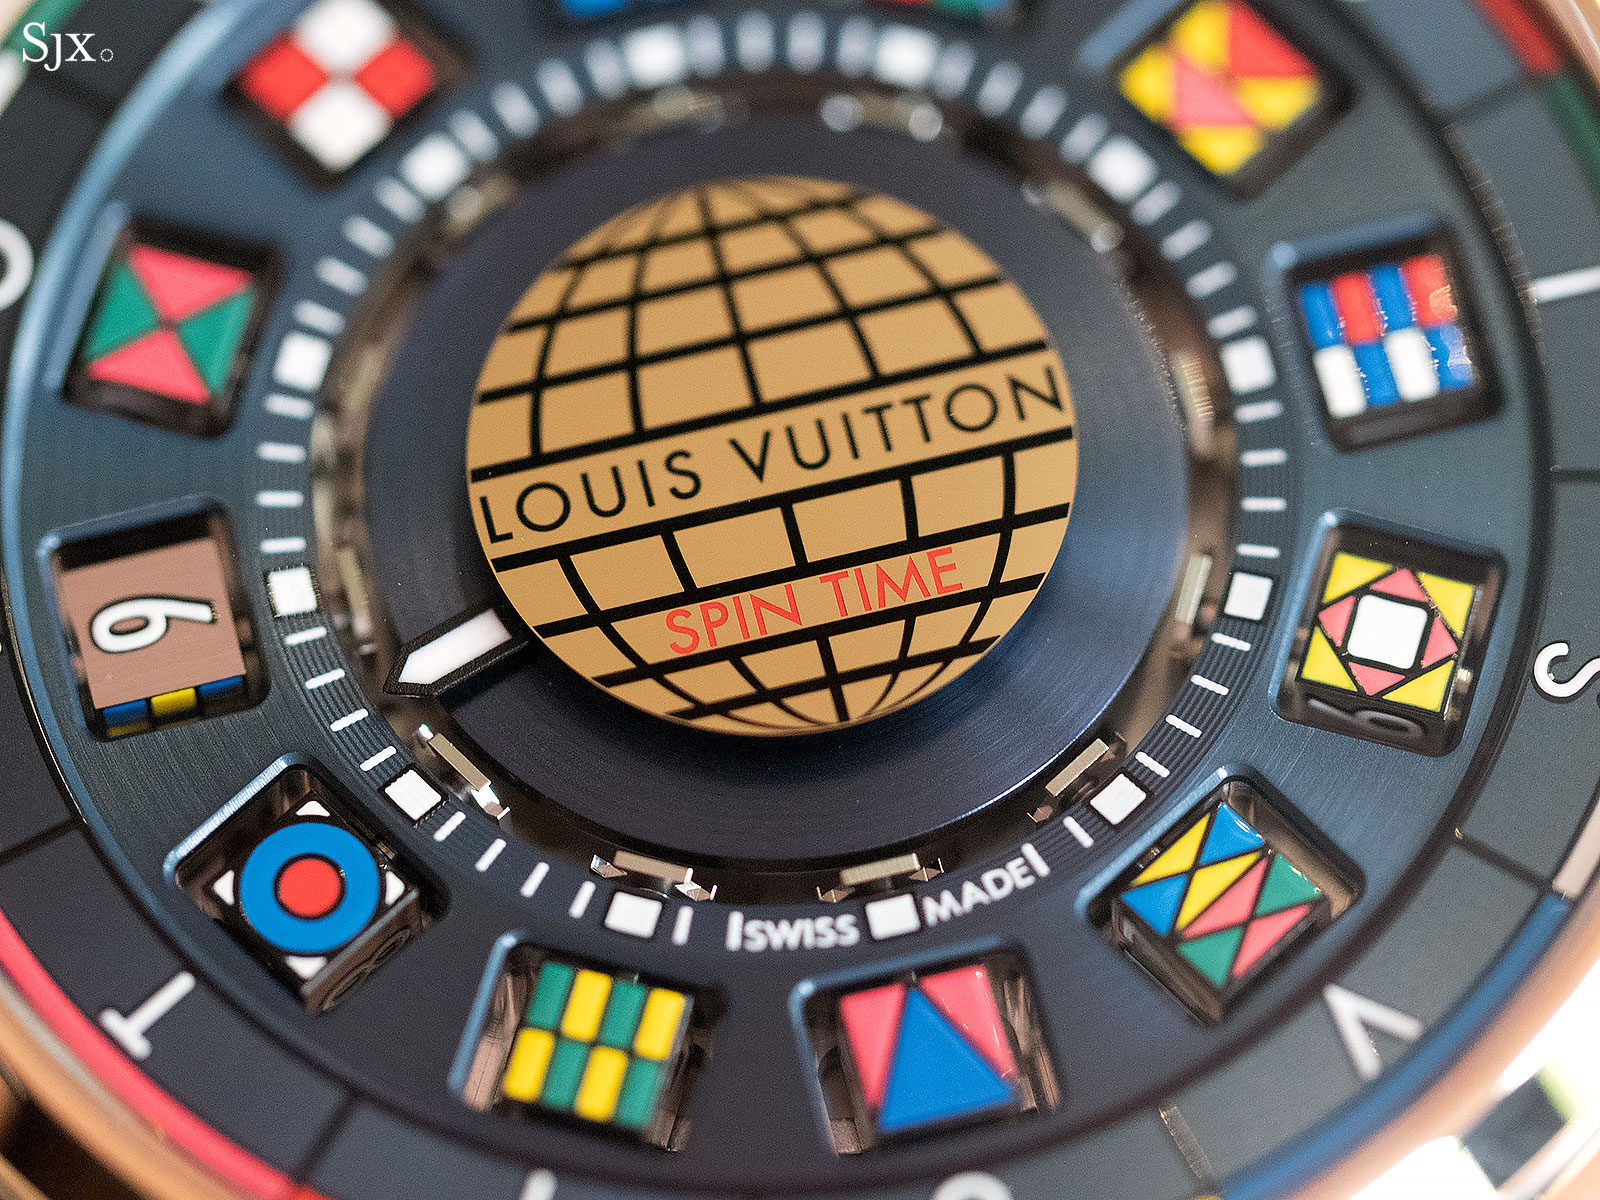 Louis Vuitton Escale Spin Time titanium gold 4